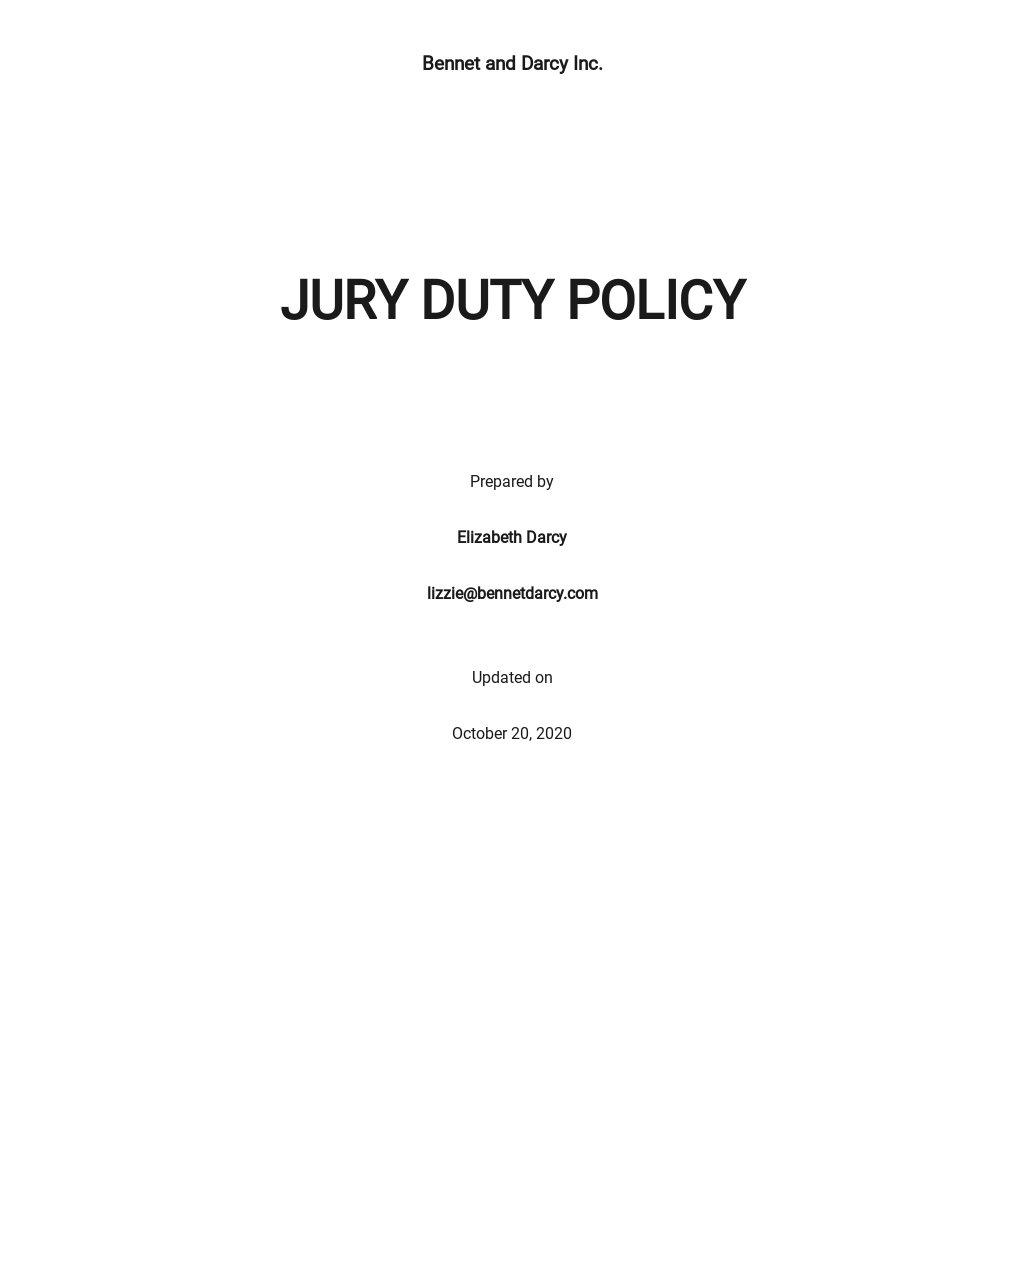 Jury Duty Policy Template.jpe